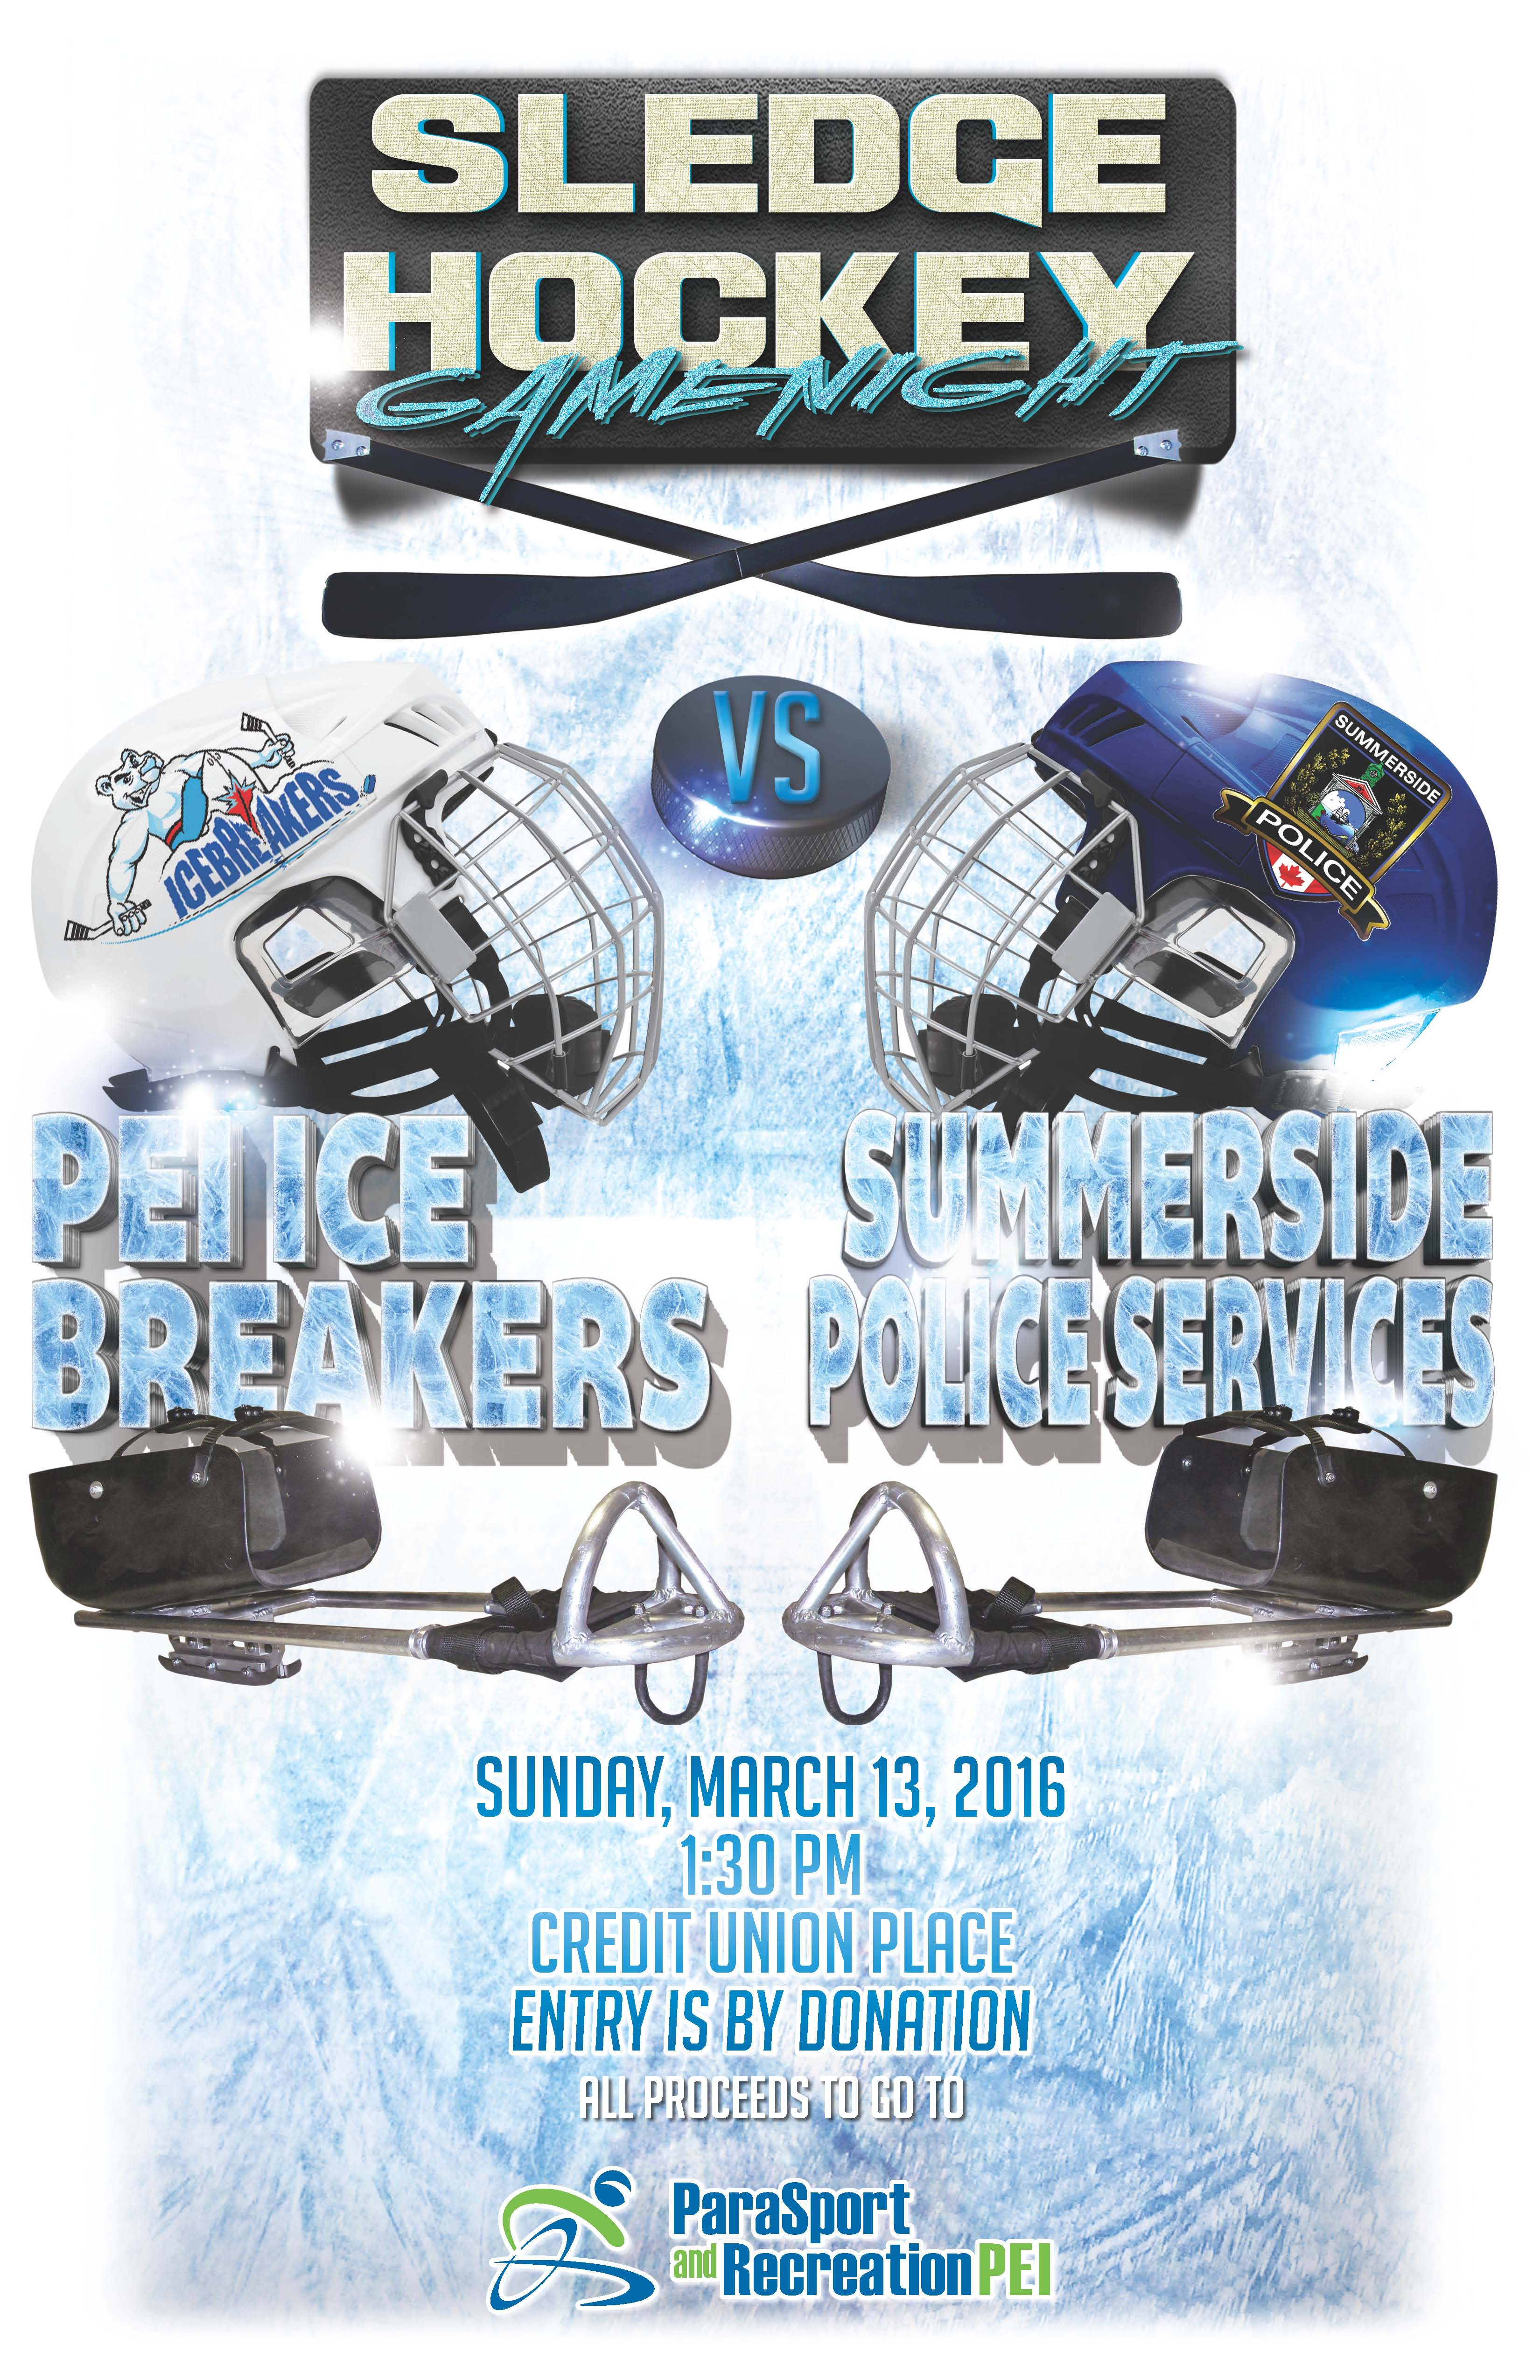 PEI Ice Breakers Vs Summerside Police Services